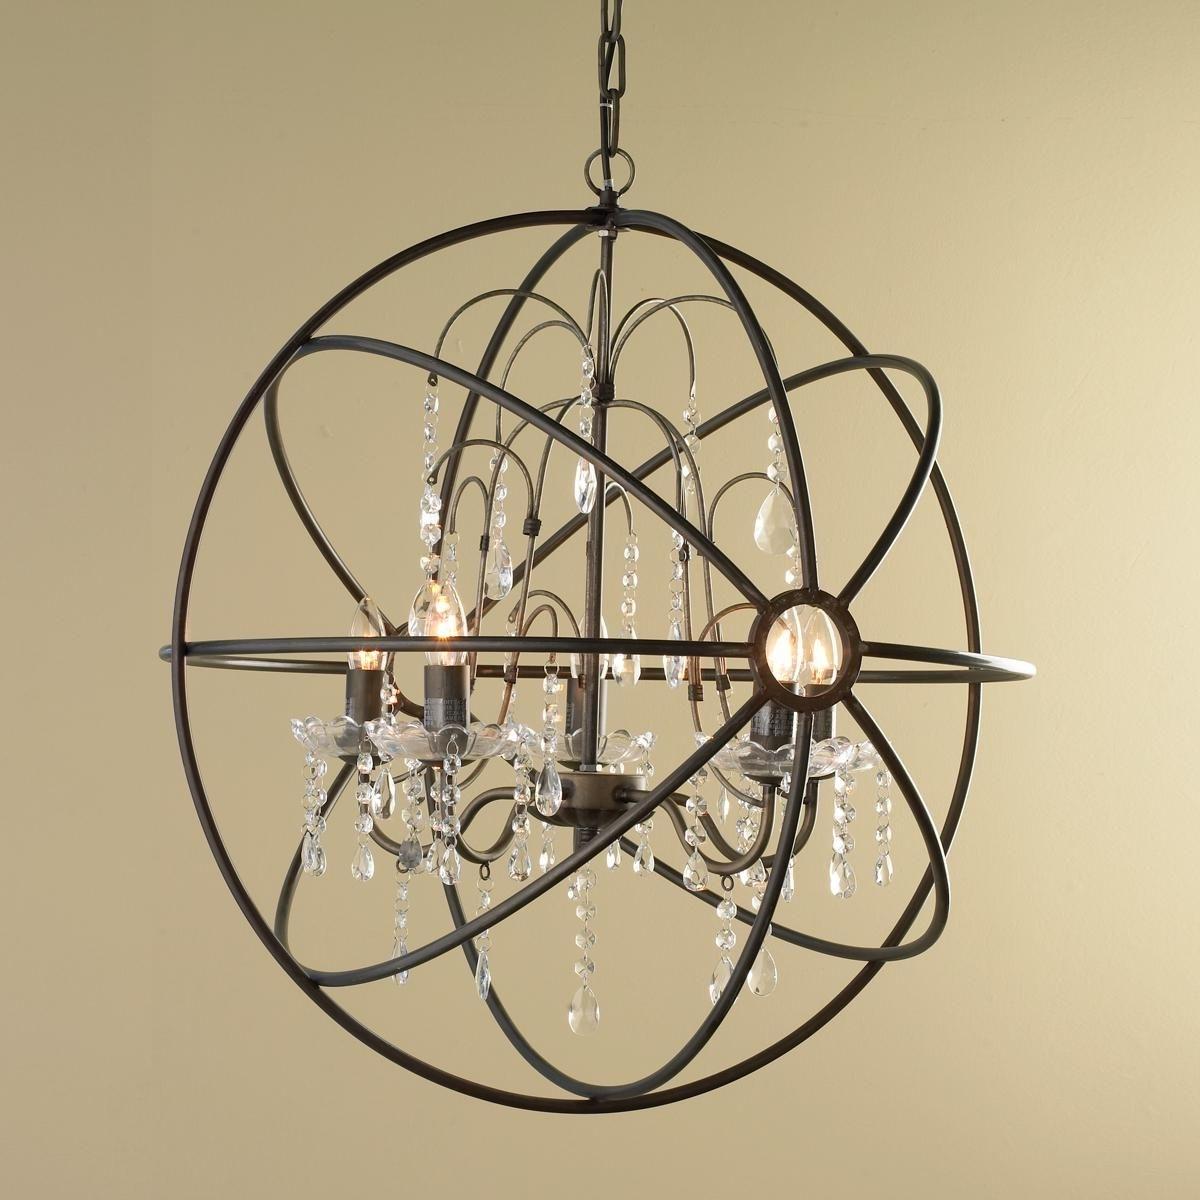 Metal Sphere Chandelier Regarding Famous Crystal And Metal Orb Chandelier (View 5 of 20)